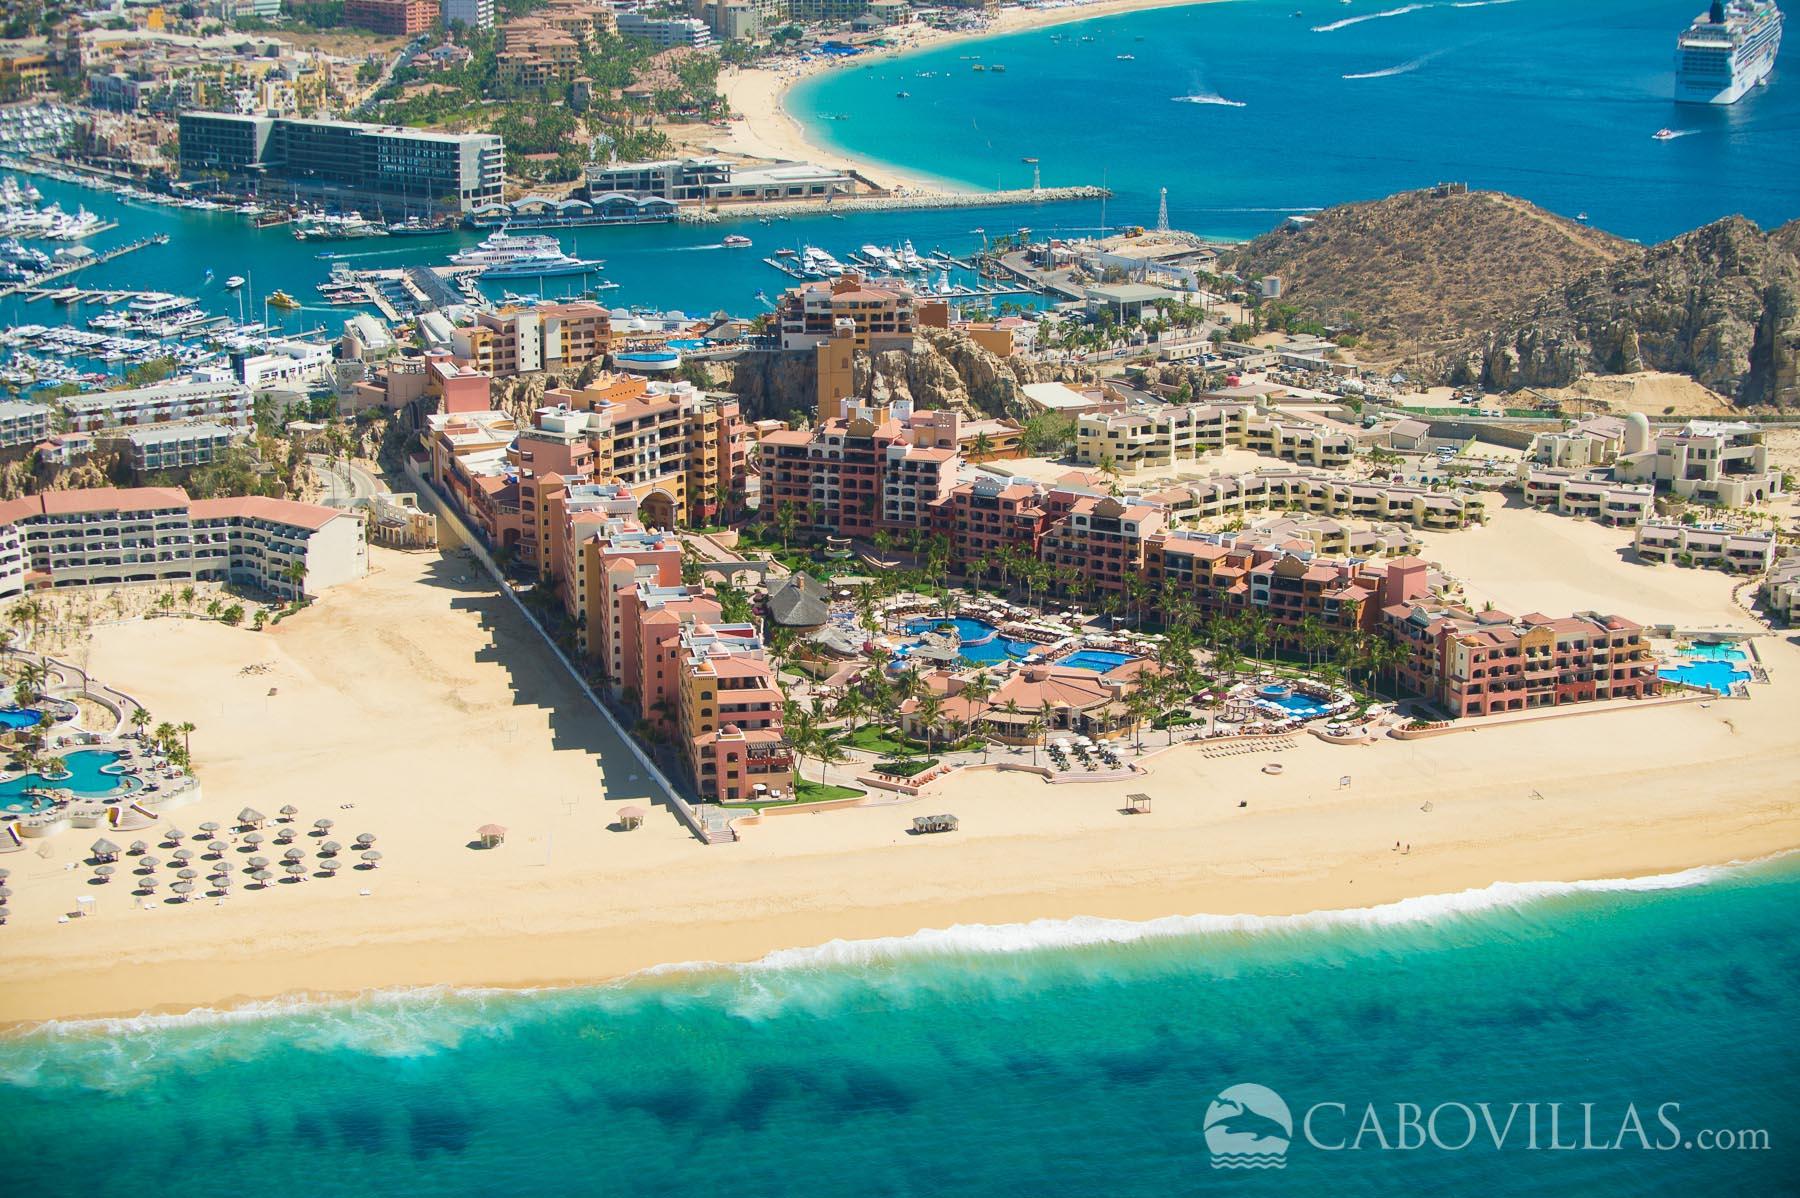 Cabovillas Com Cabo San Lucas Reviews Playa Grande Beach Resort